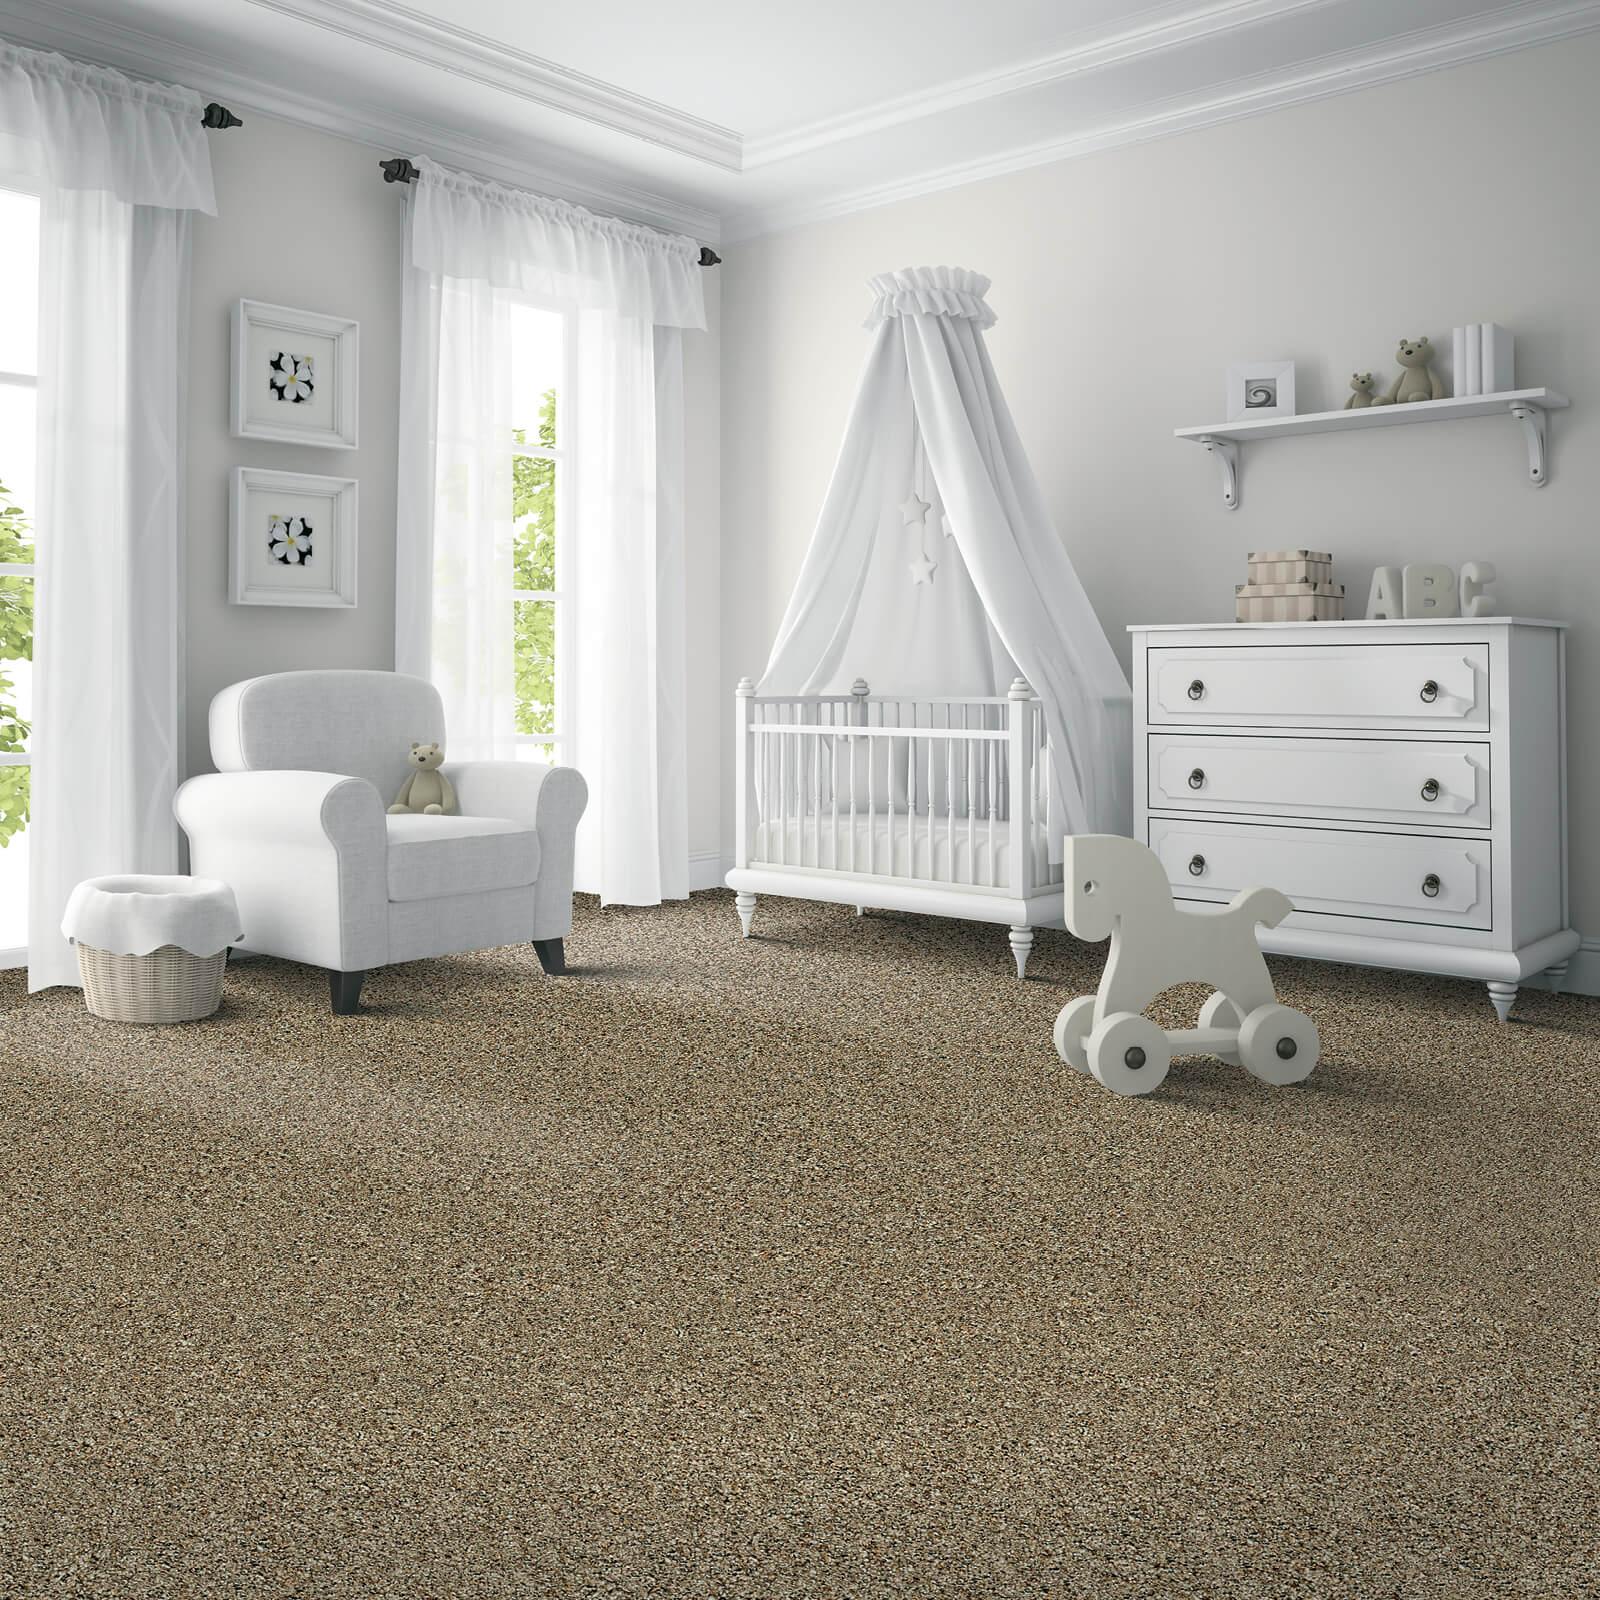 Baby room Carpet flooring | Flooring by Wilson's Carpet Plus